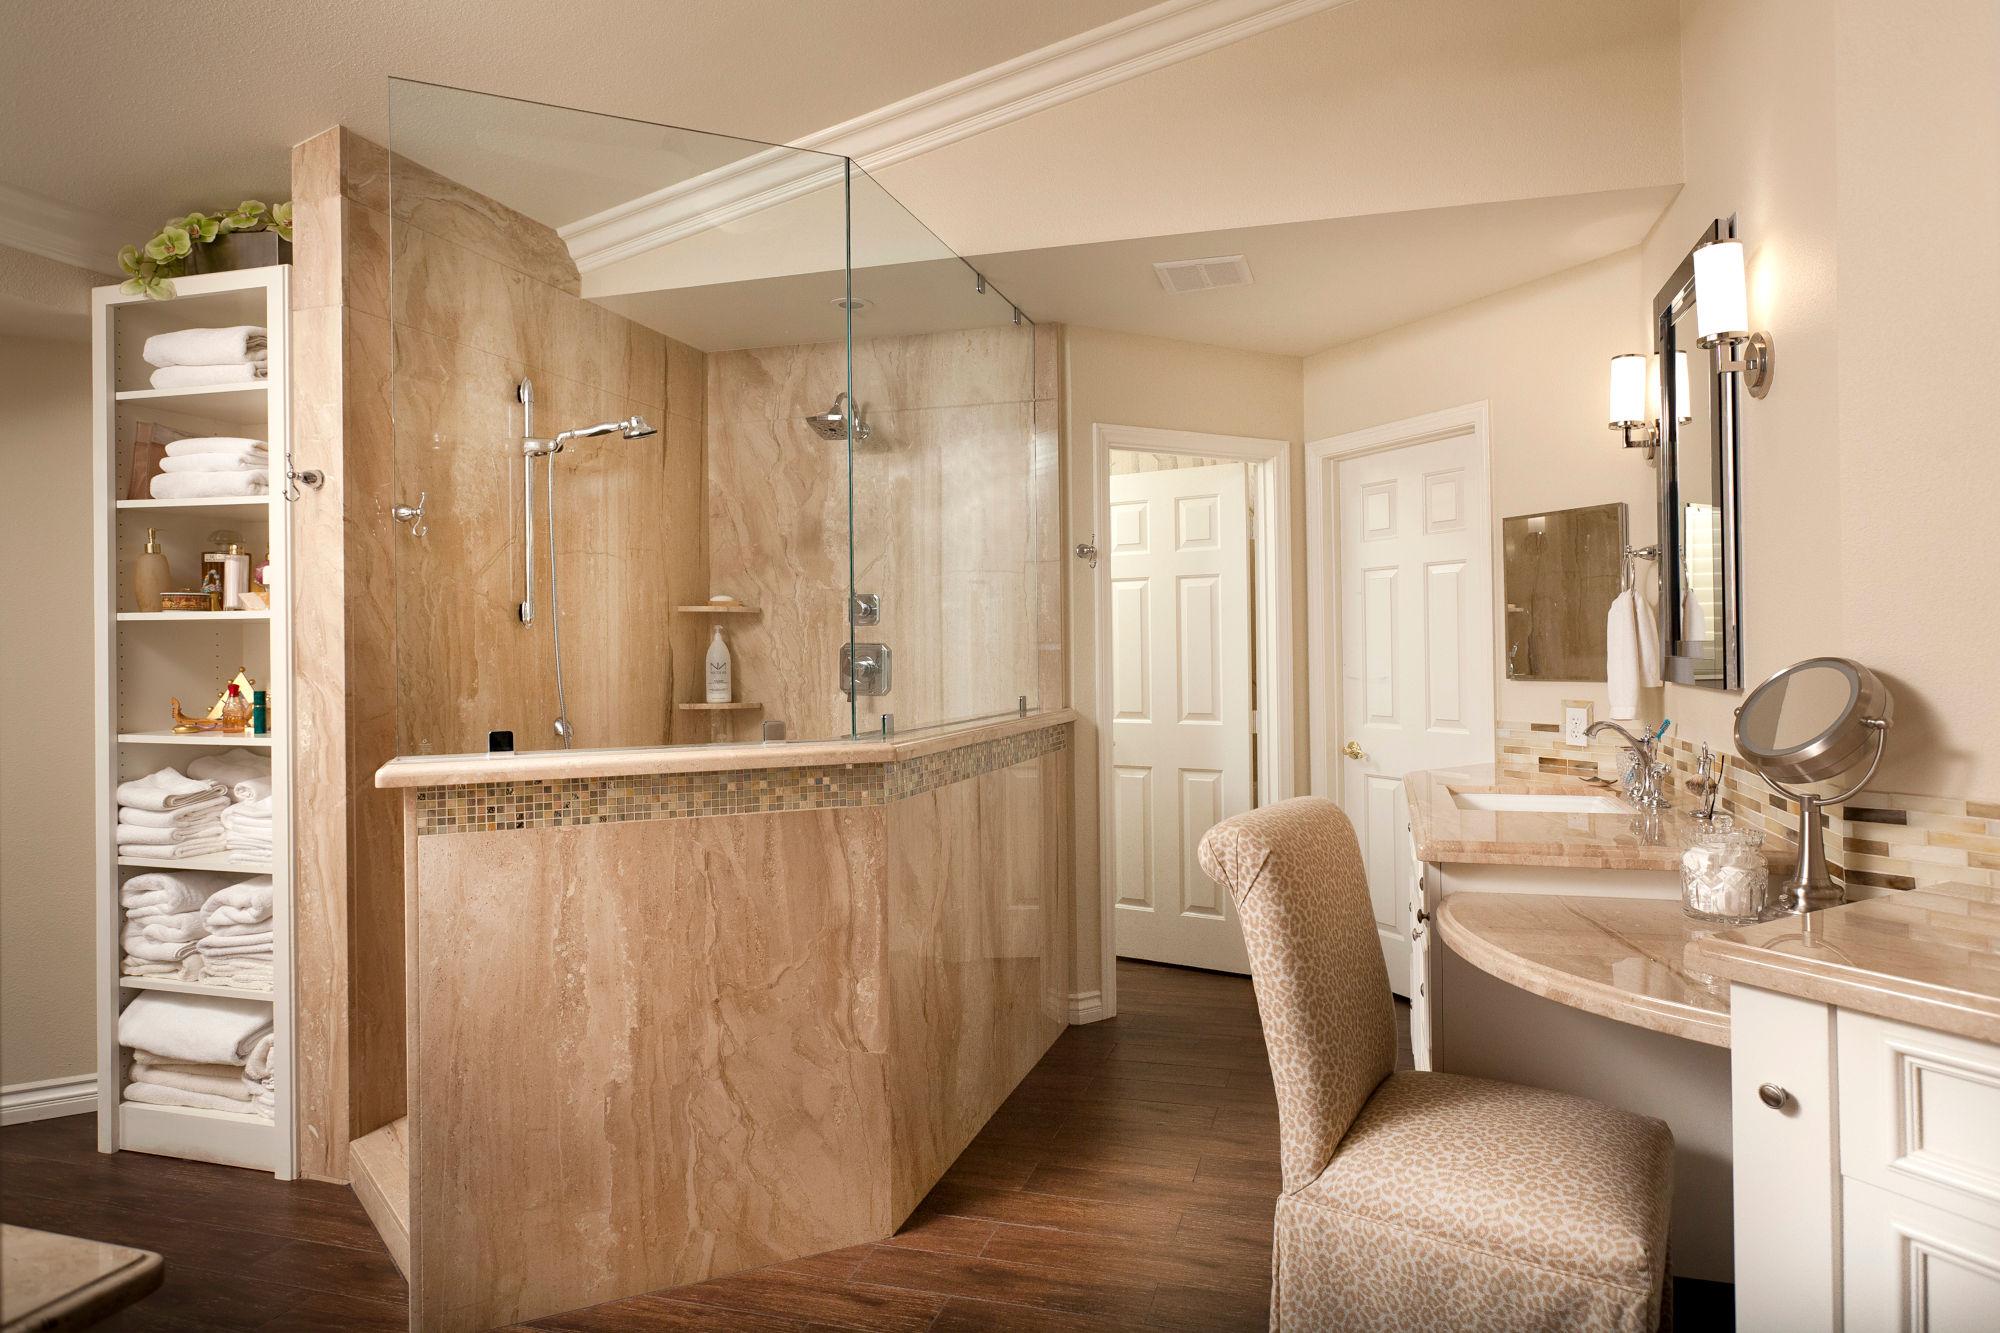 Marble slab walk-in master bath shower, built-in white wood linen cabinet and wood tile flooring.